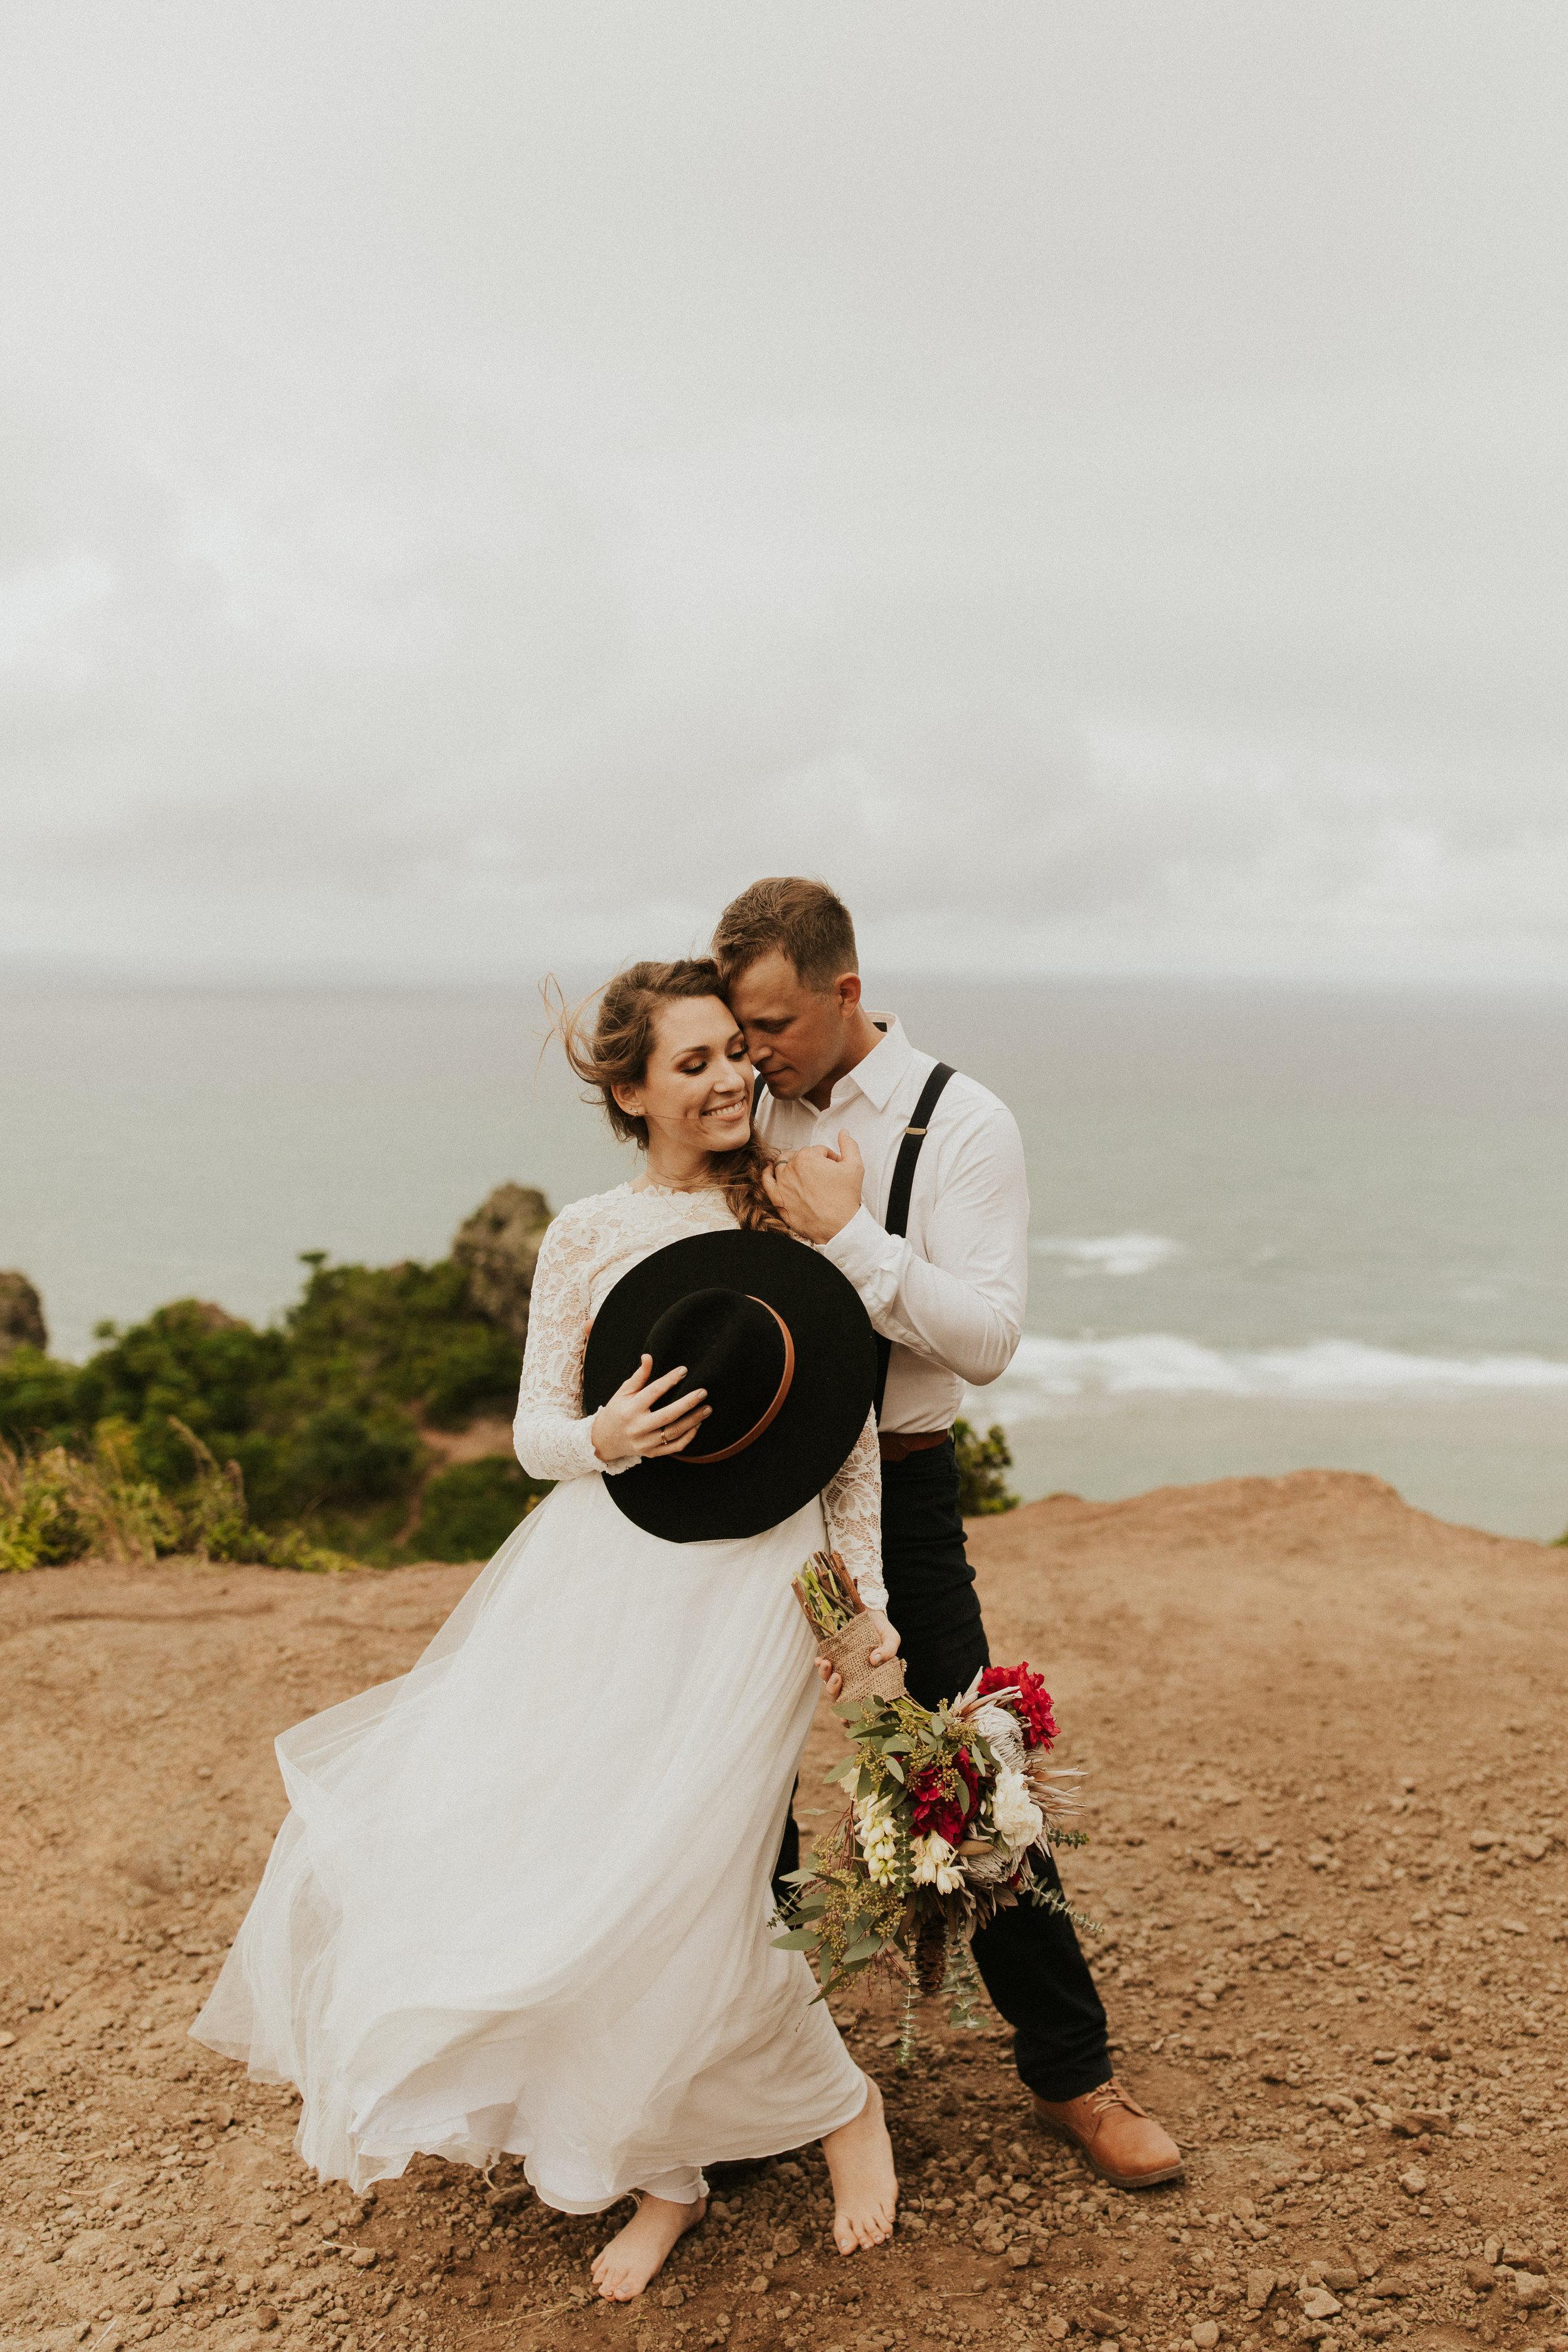 the-mclachlans-destination-elopement-photographers-mountain-hike-sena-eric-90.jpg